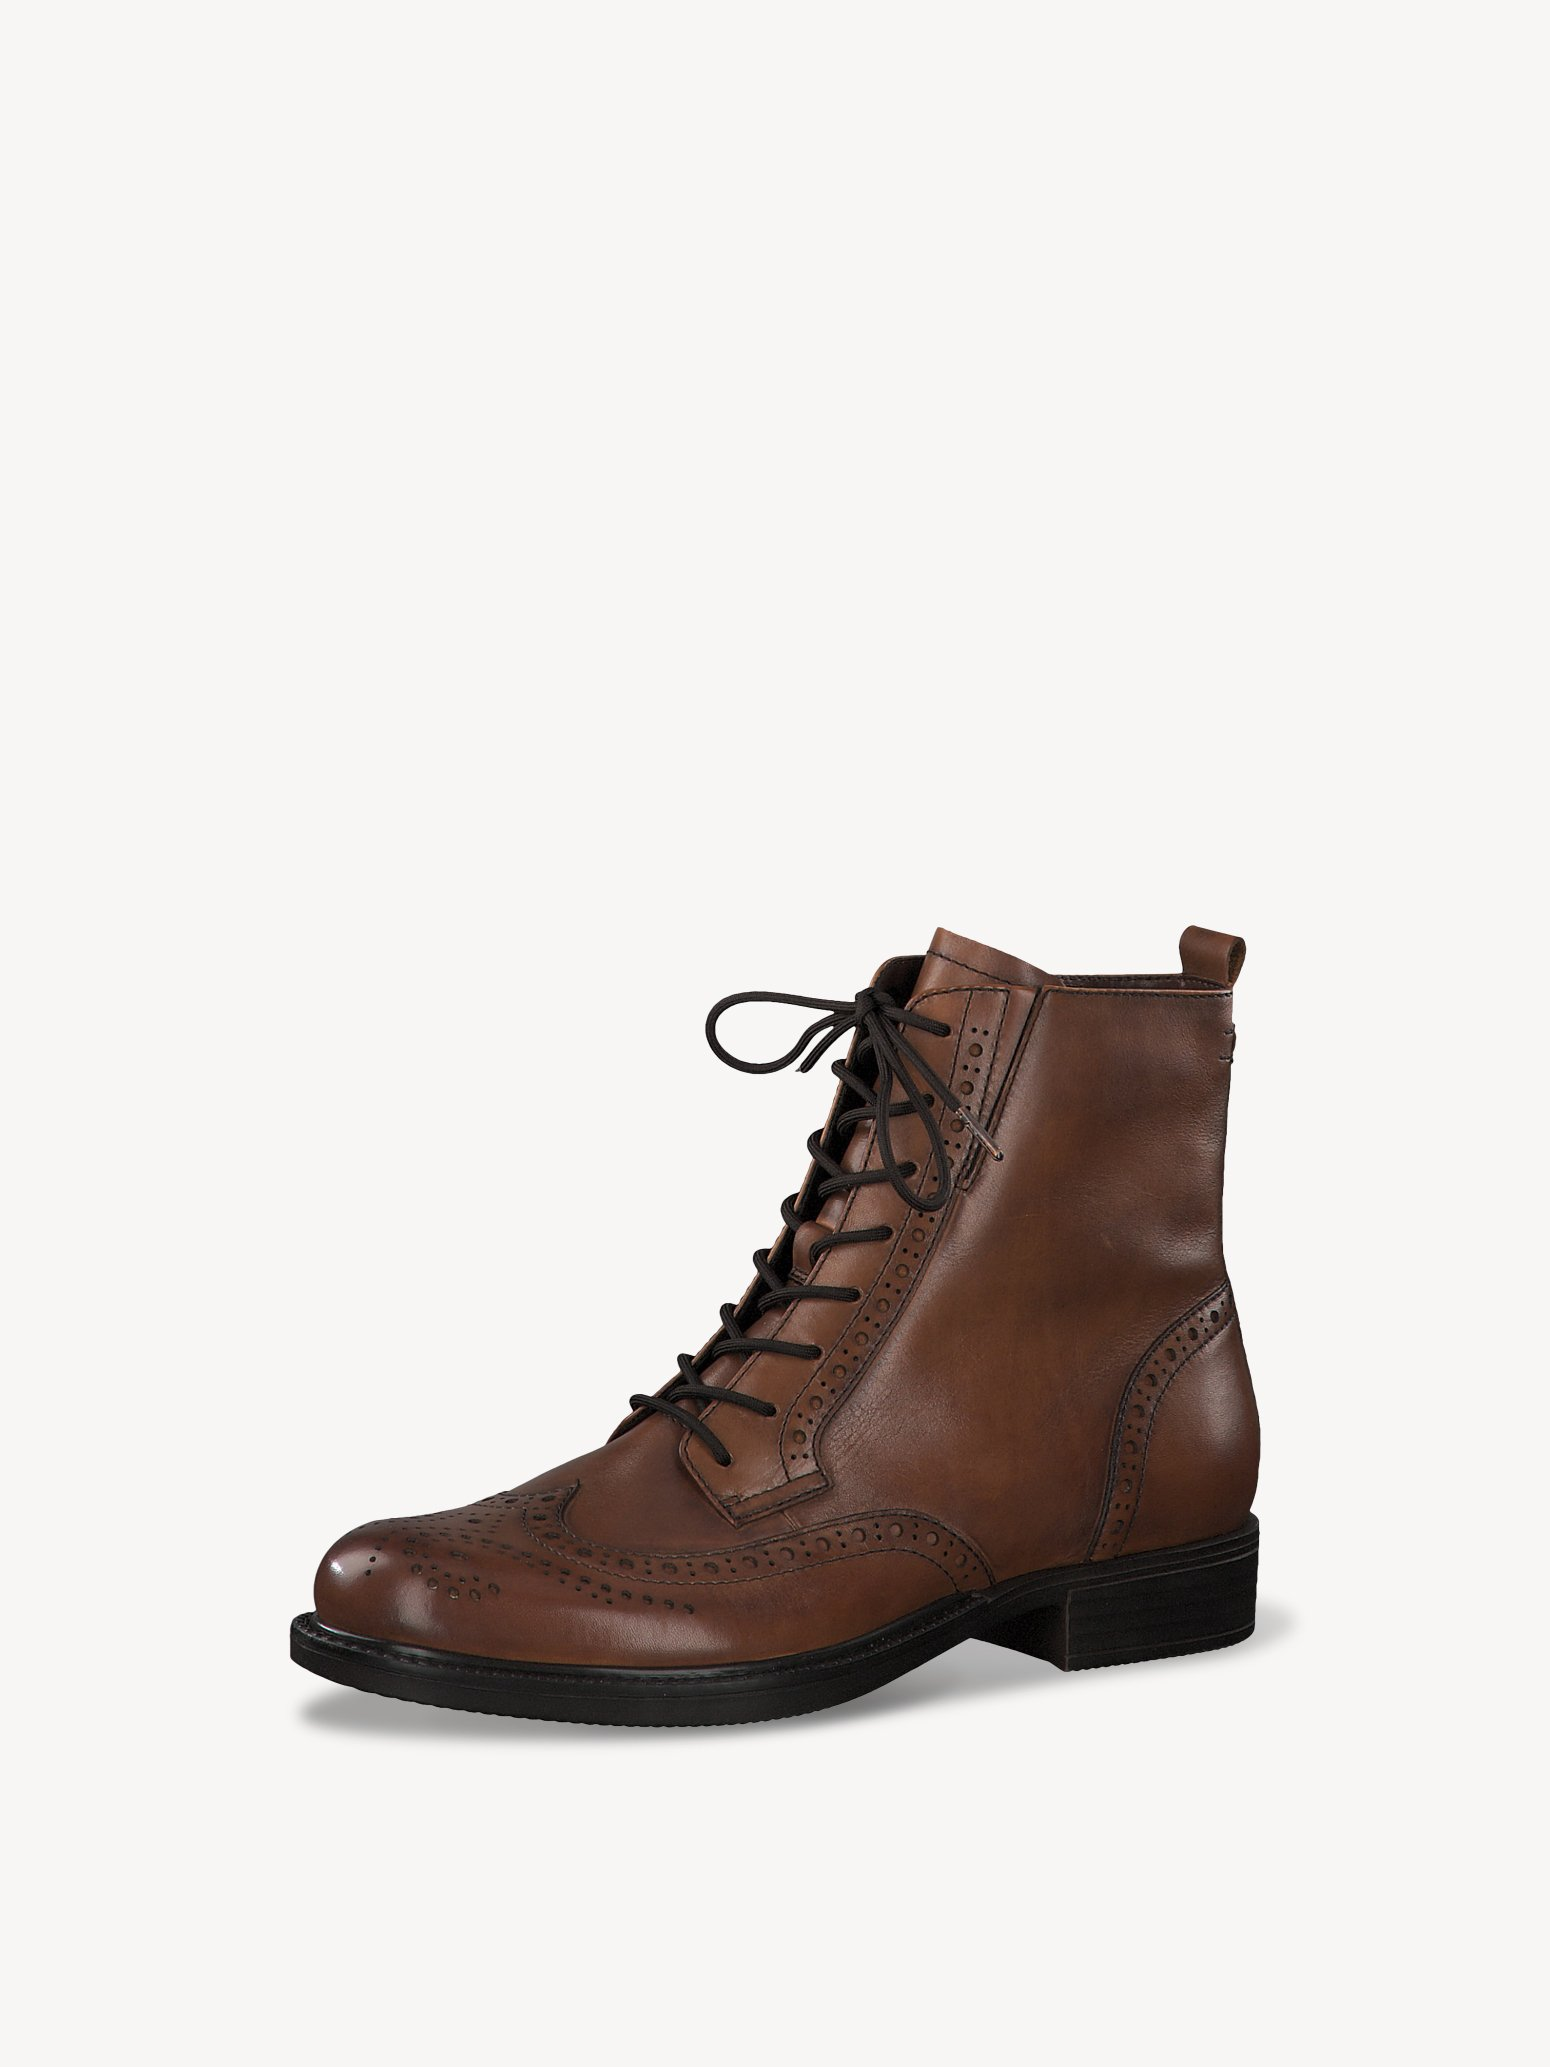 Ботинки Tamaris 1-1-25106-25-305